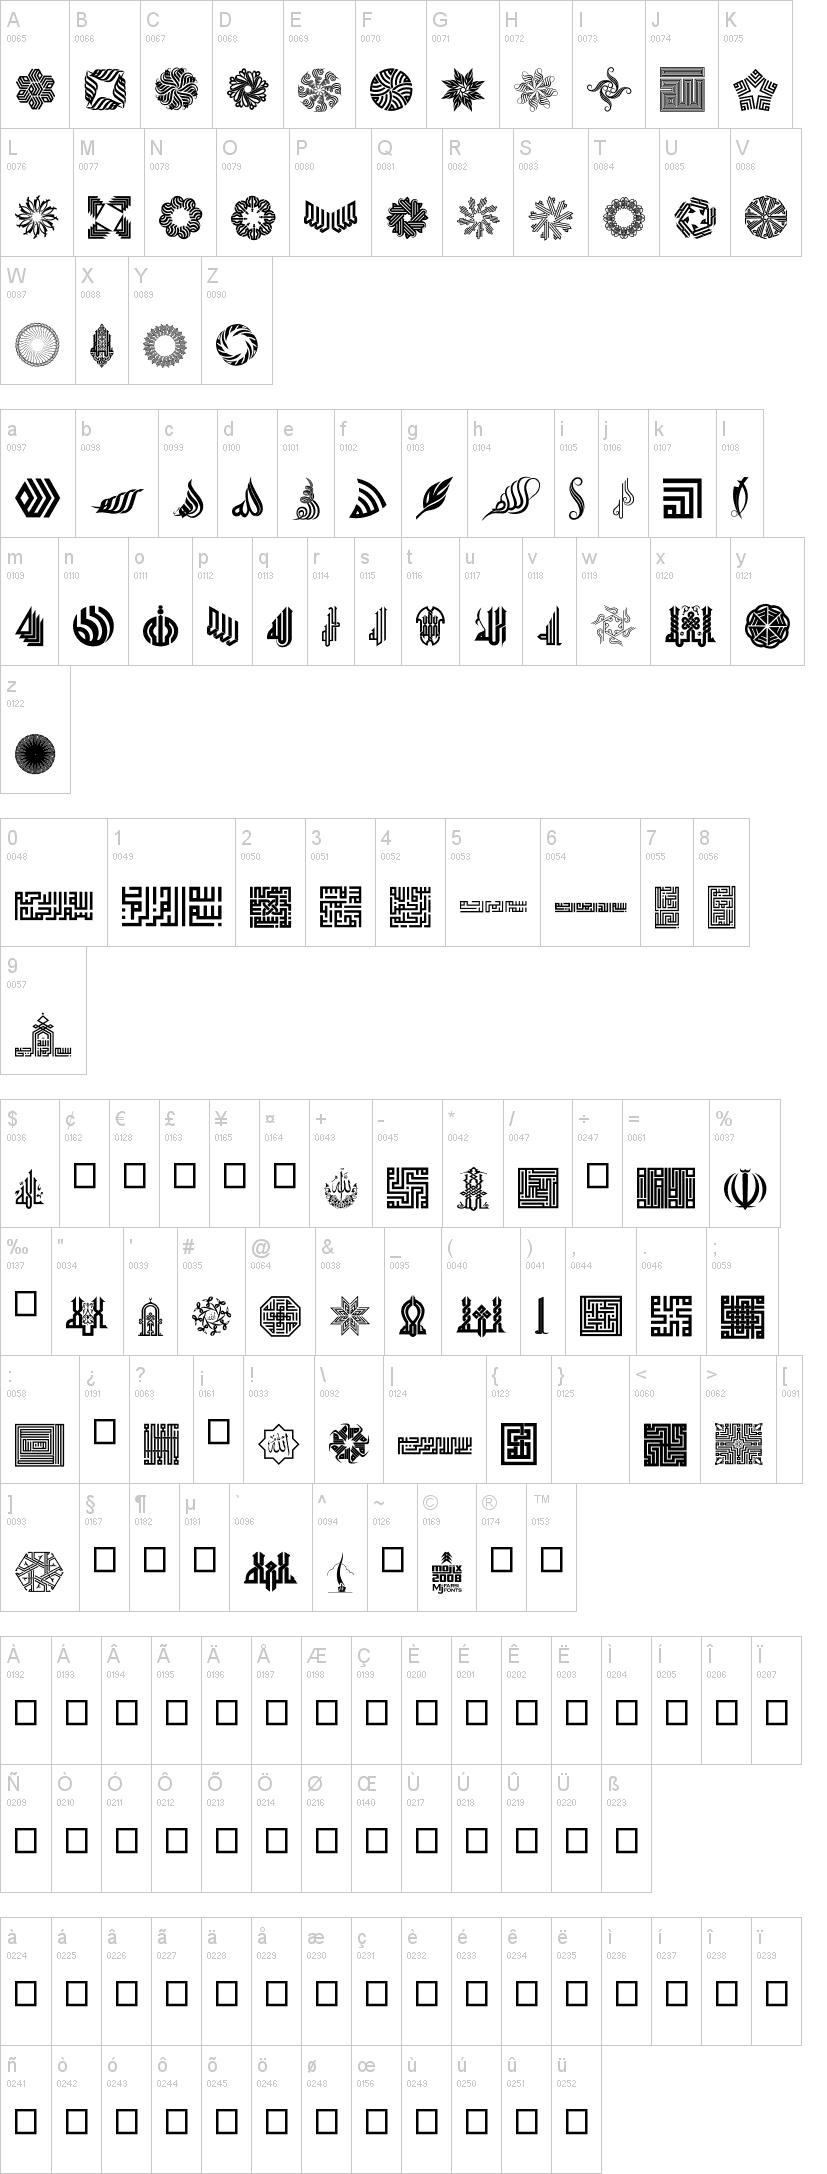 Besmellah 1 Font   dafont com   Paper, Hand Drawn, Patterns